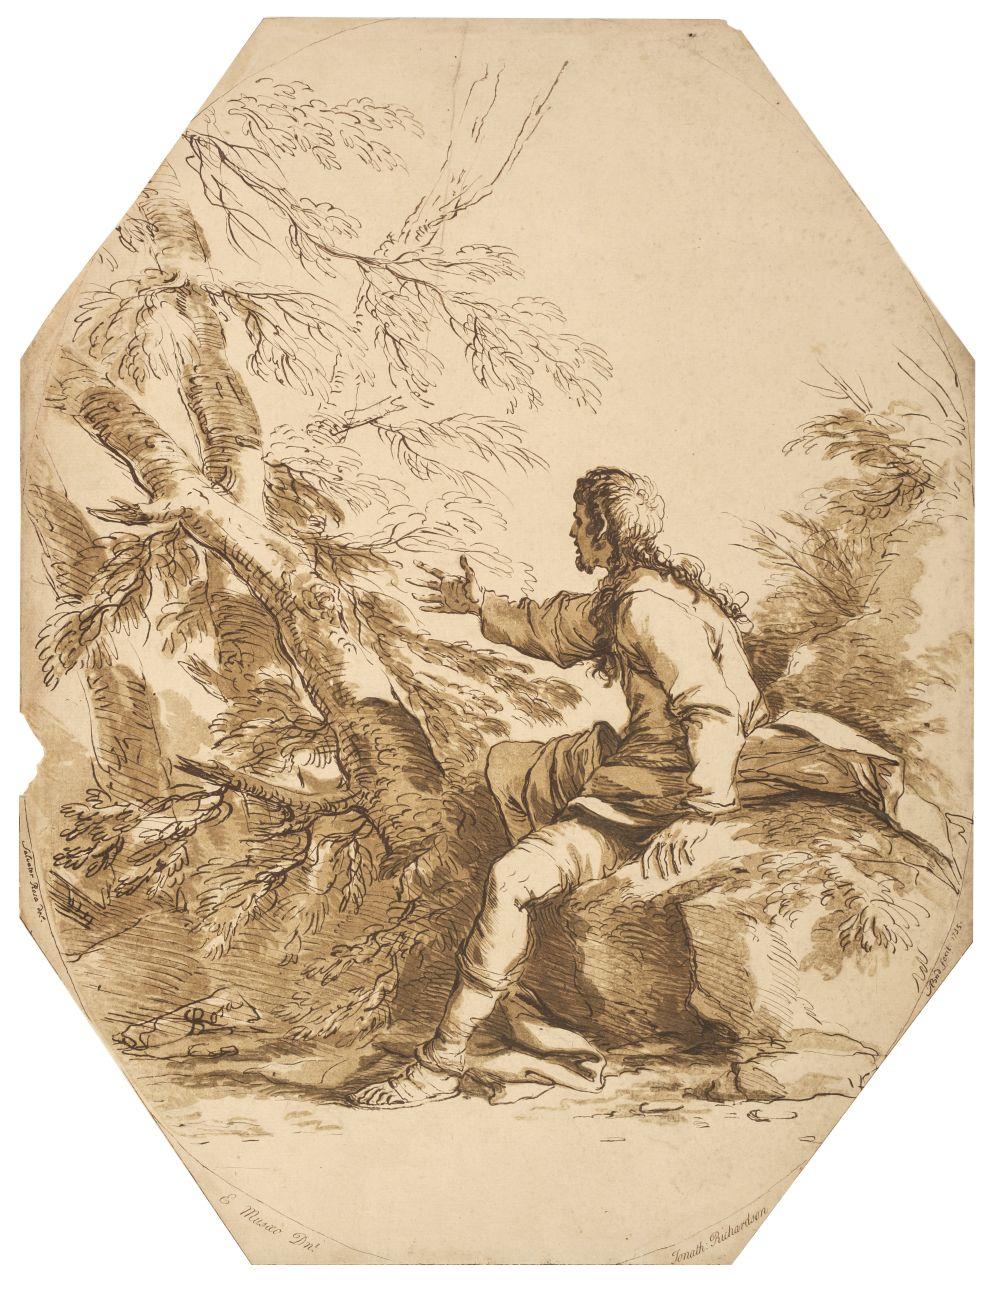 Pond (Arthur & Charles Knapton). A bound volume of 92 plates, 1734-43